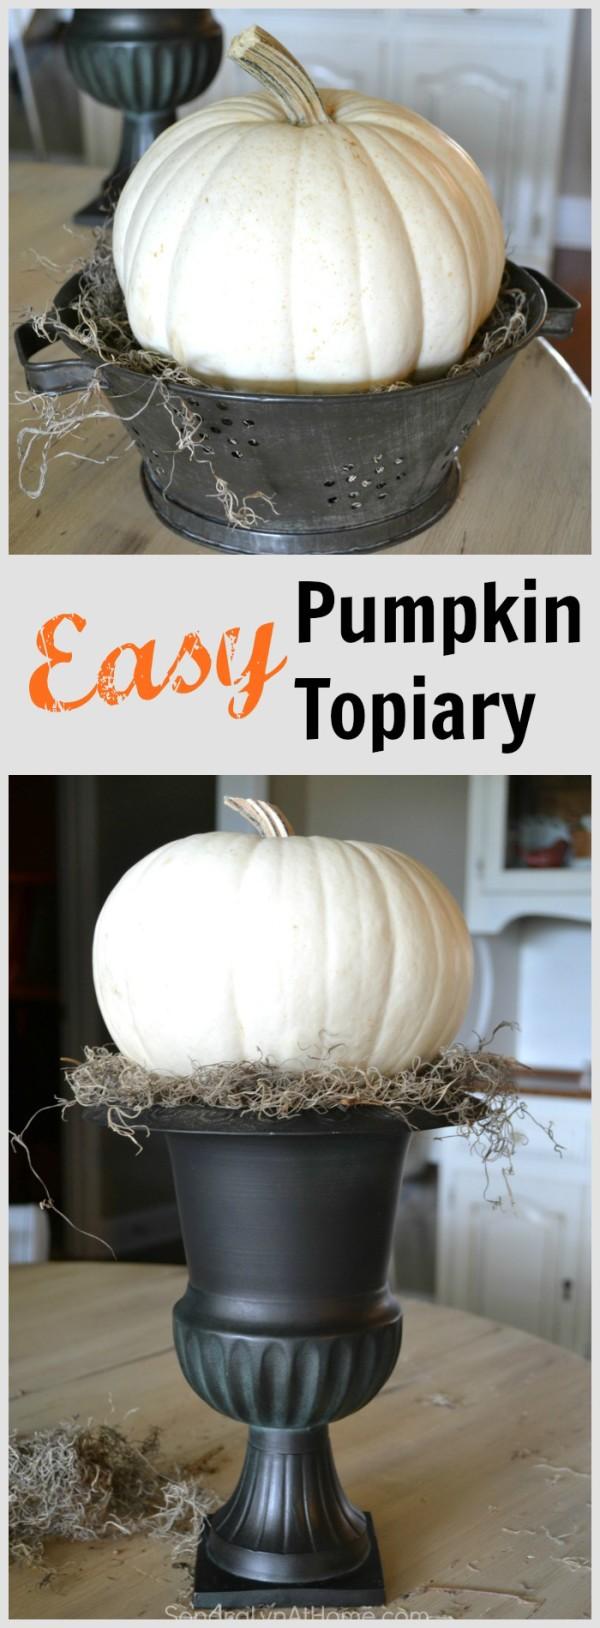 Easy PumpkinTopiary- SondraLyn at Home